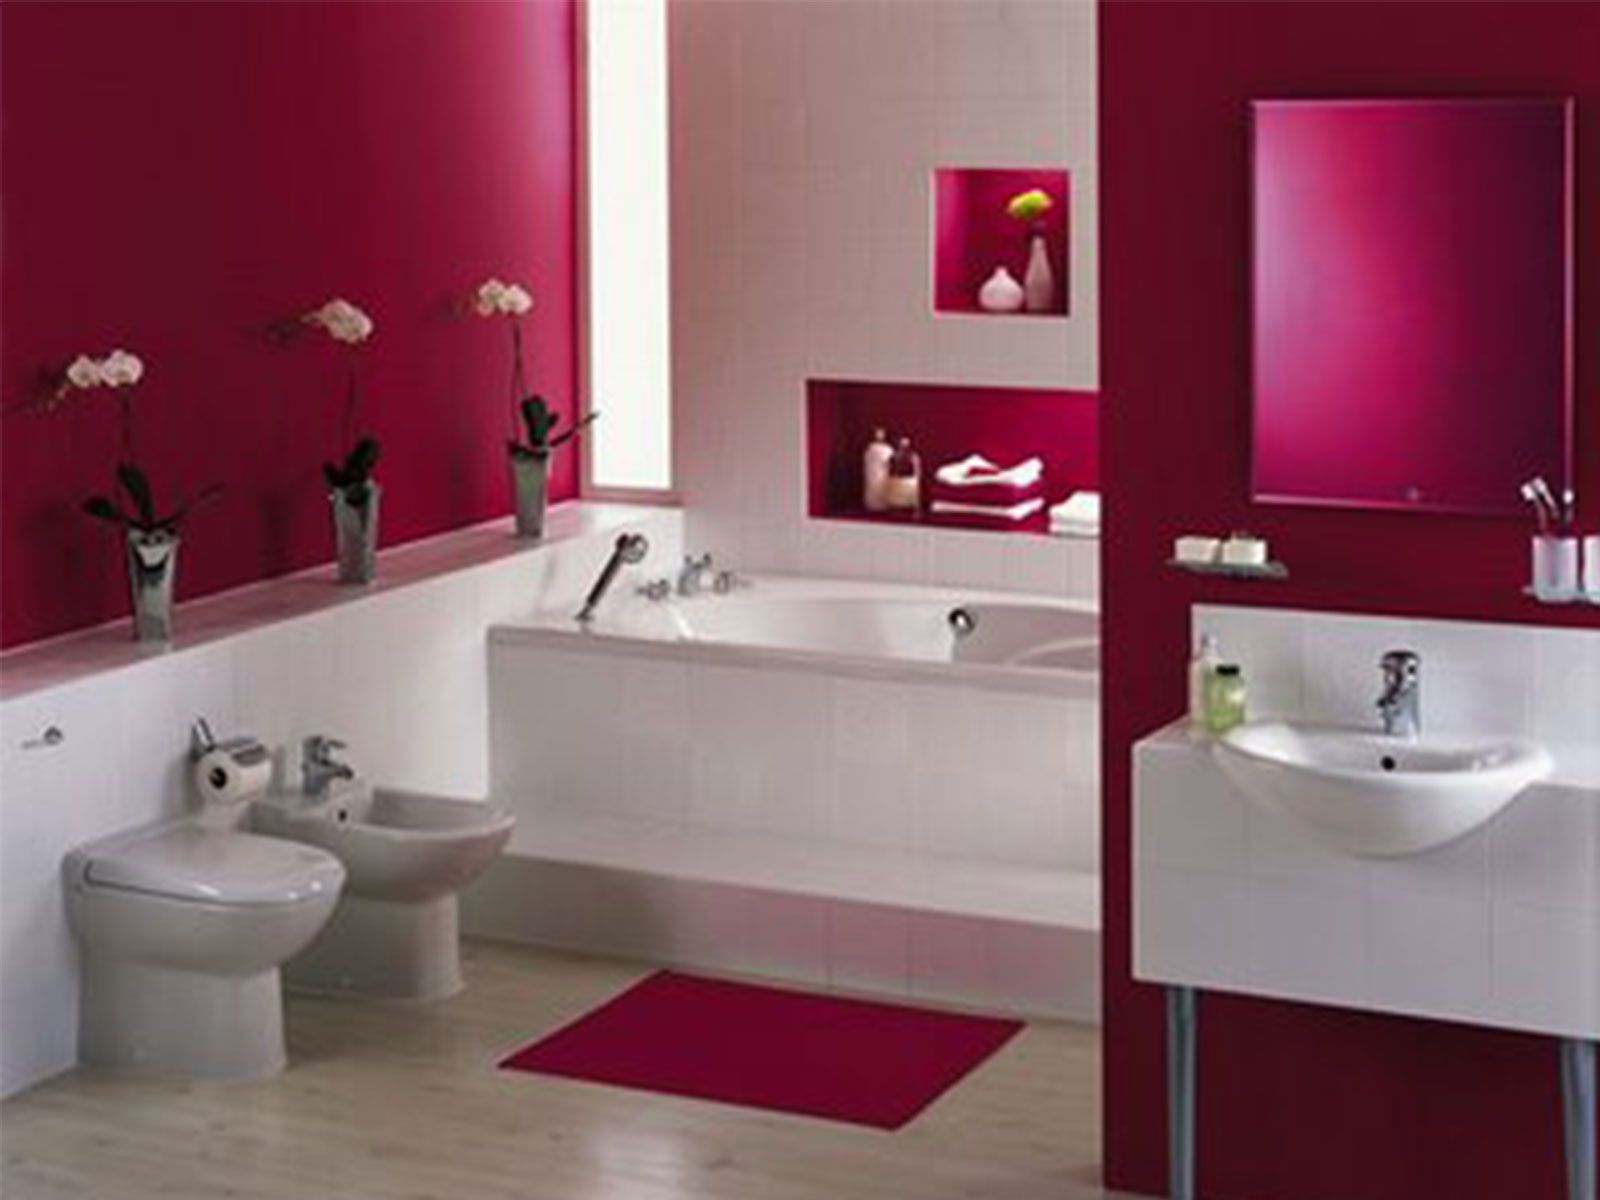 Red And Black Bathroom Design Ideas Http Tyuka Info Red And Black Bathroom Design Ideas Based On What Simple Bathroom White Bathroom Decor Bathroom Red